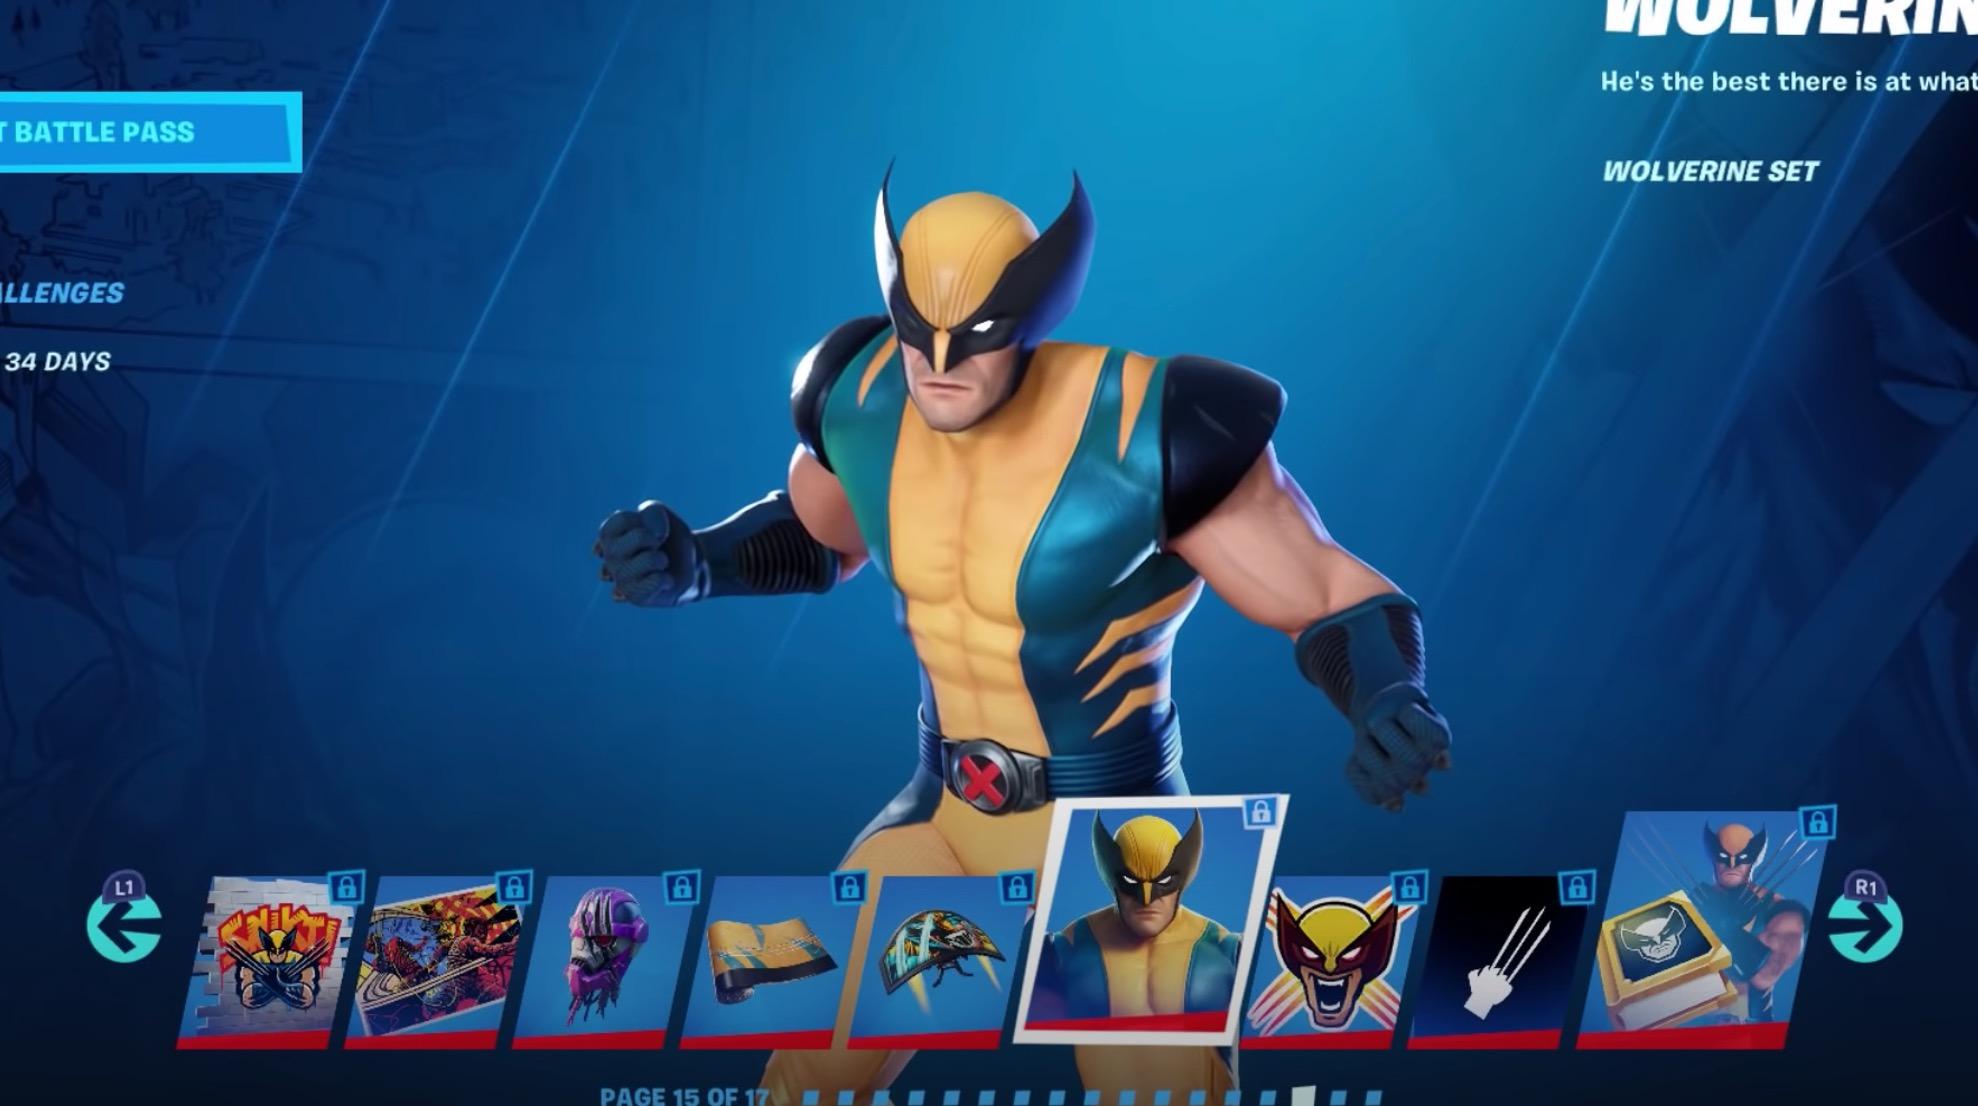 Wolverine cosmetics in Fortnite